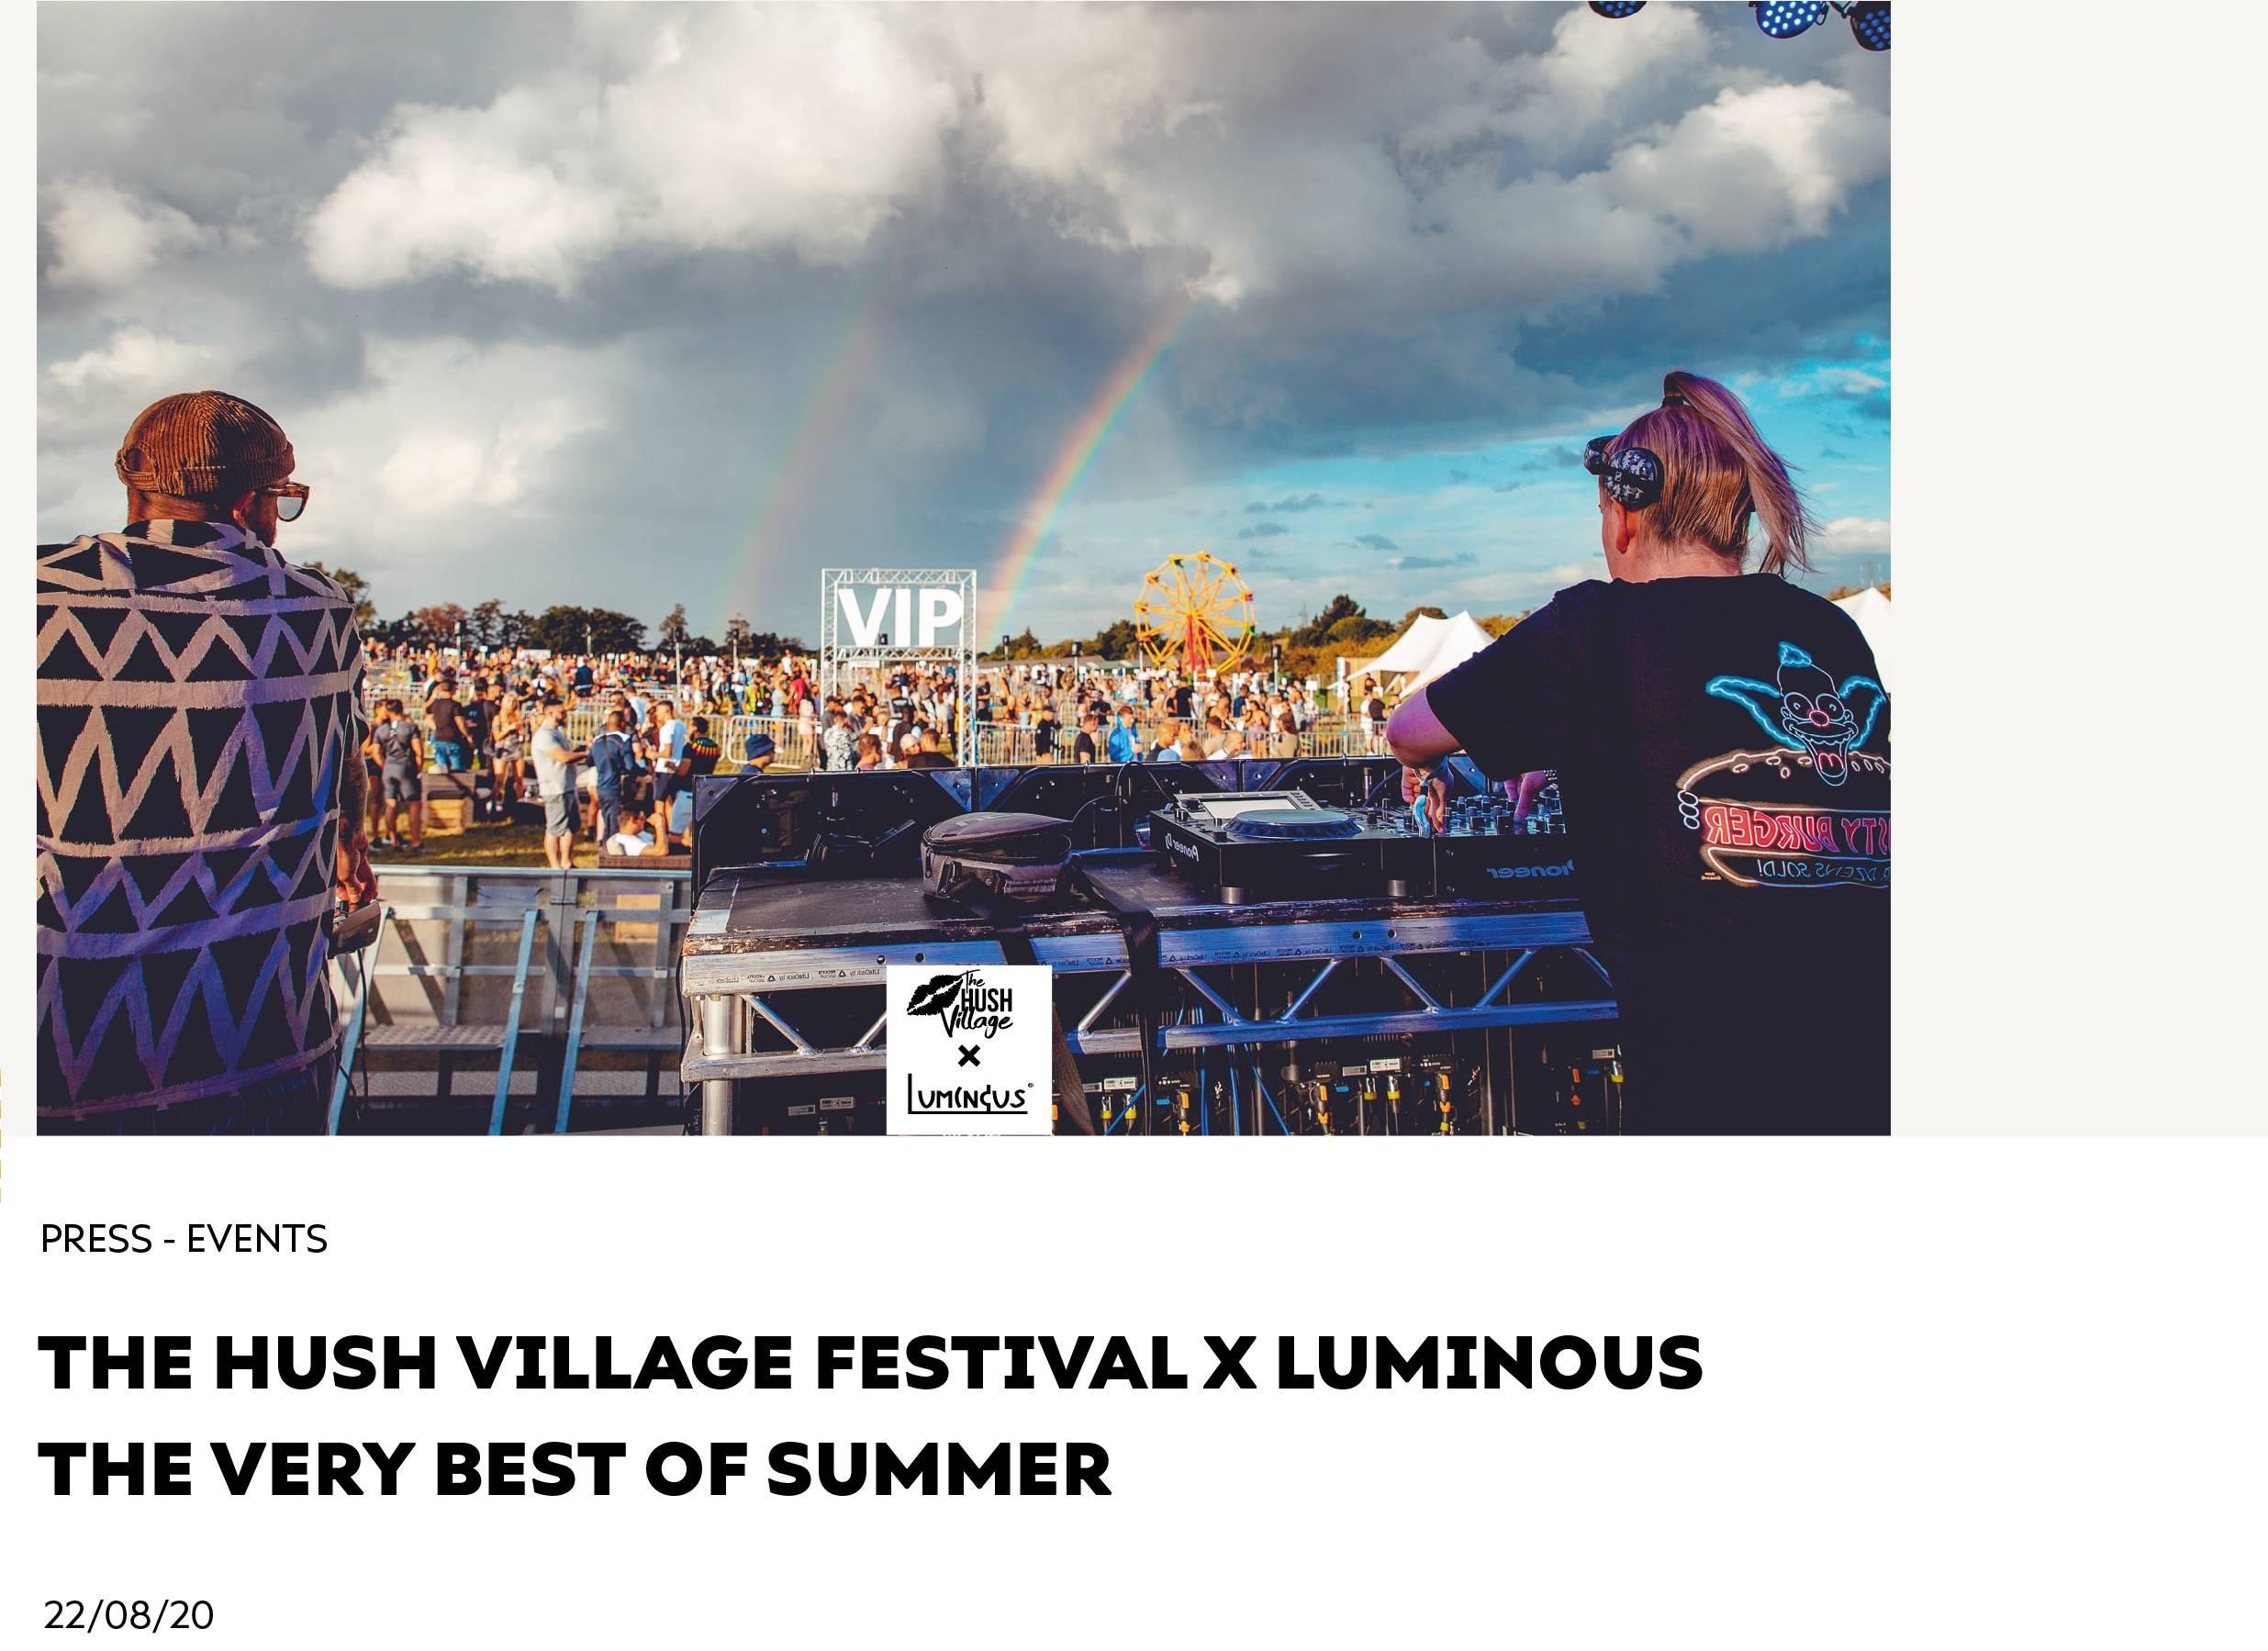 The Hush Village Festival x Luminous The Very Best Of Summer